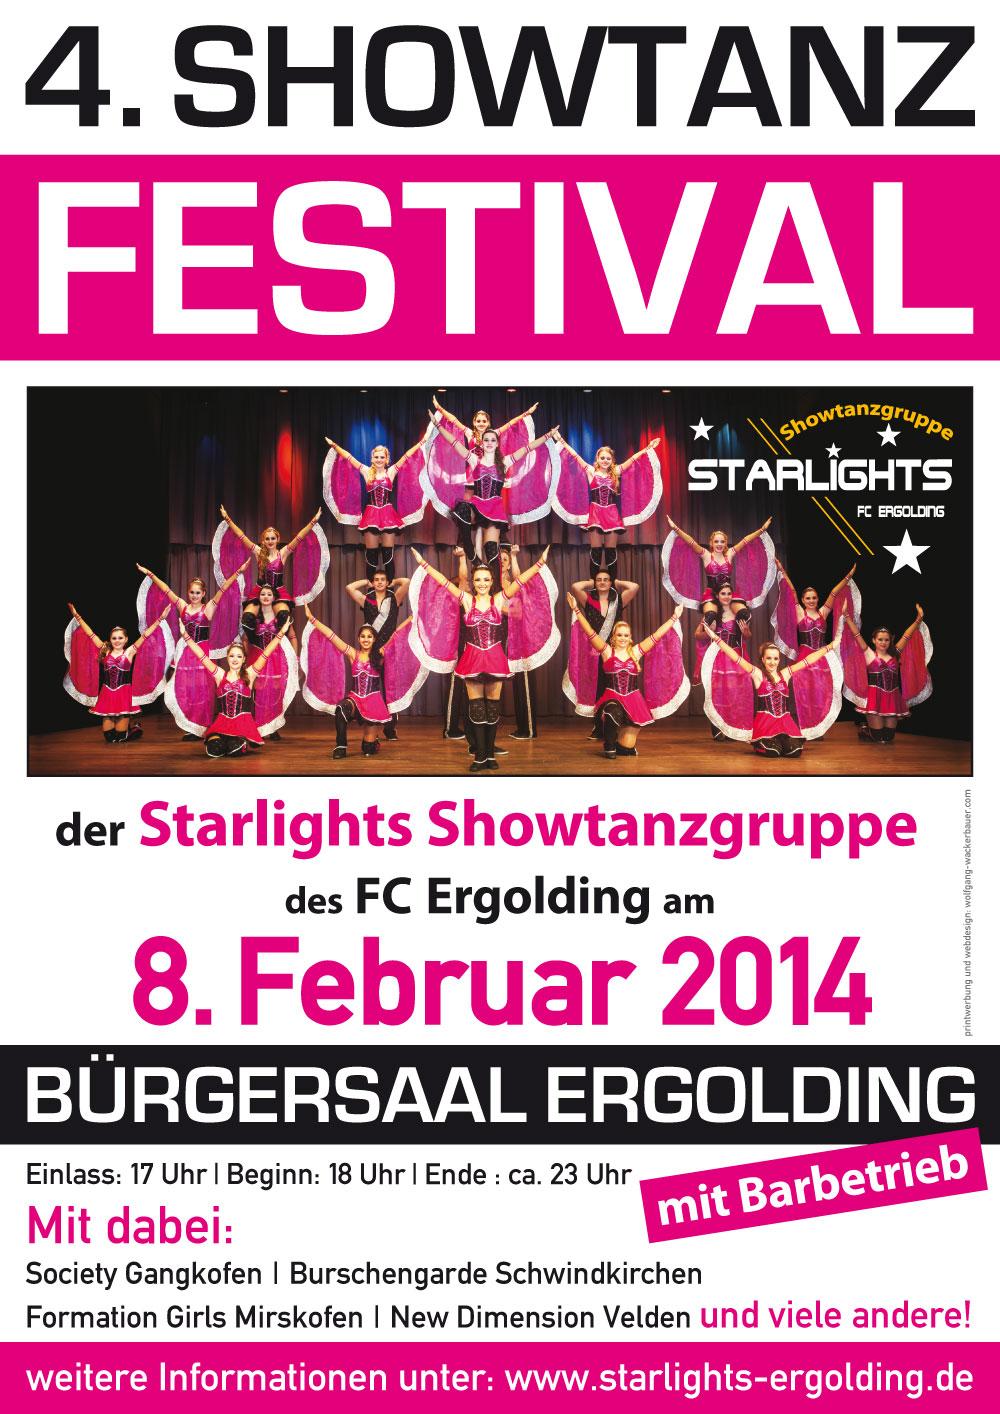 4. Showtanzfesival der Starlights Ergolding am 8. Februar 2014